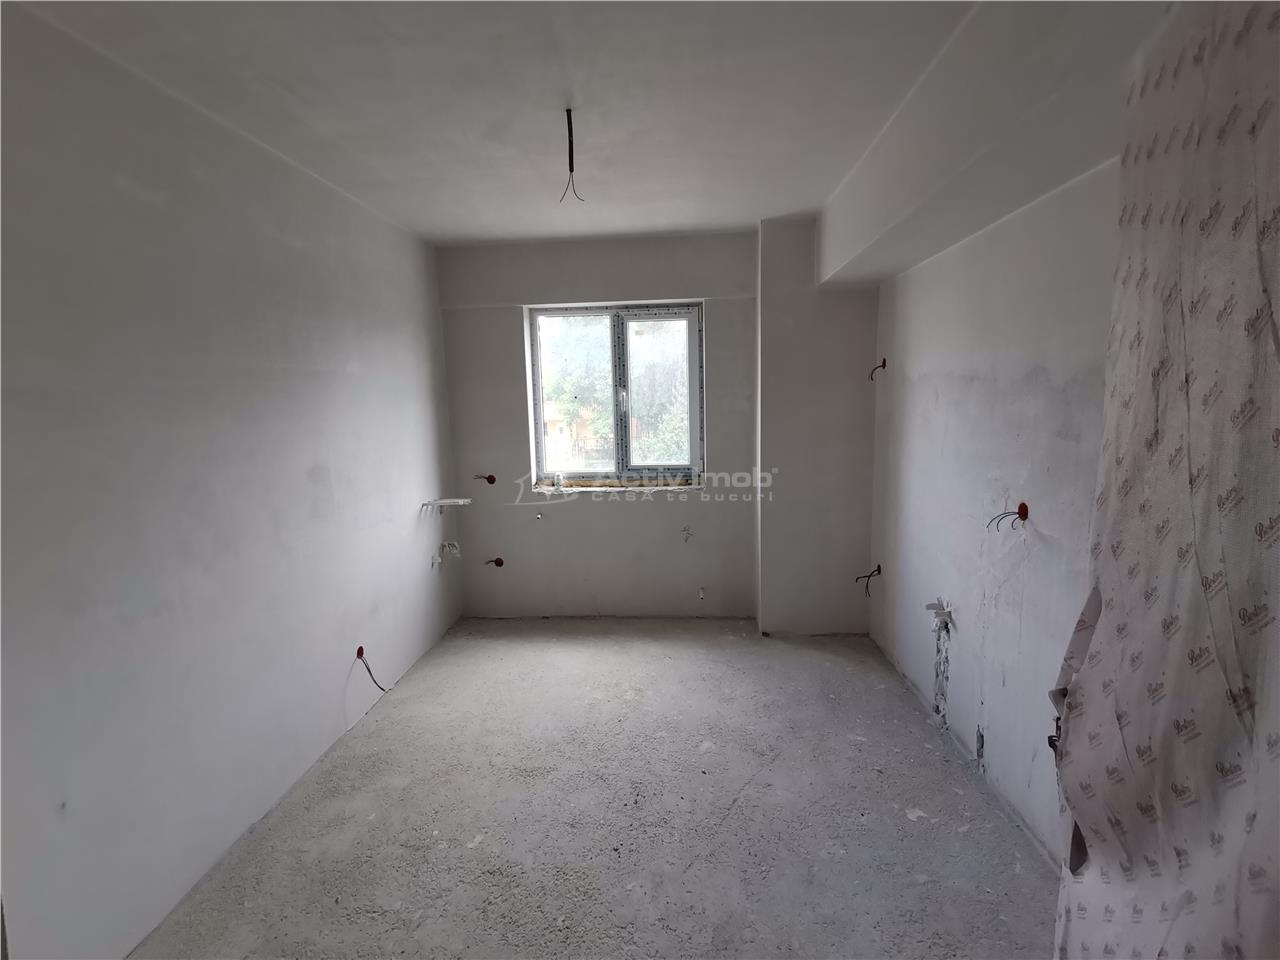 Apartament 2 camere, bloc nou, centrala, 53 mp, Comision 0%